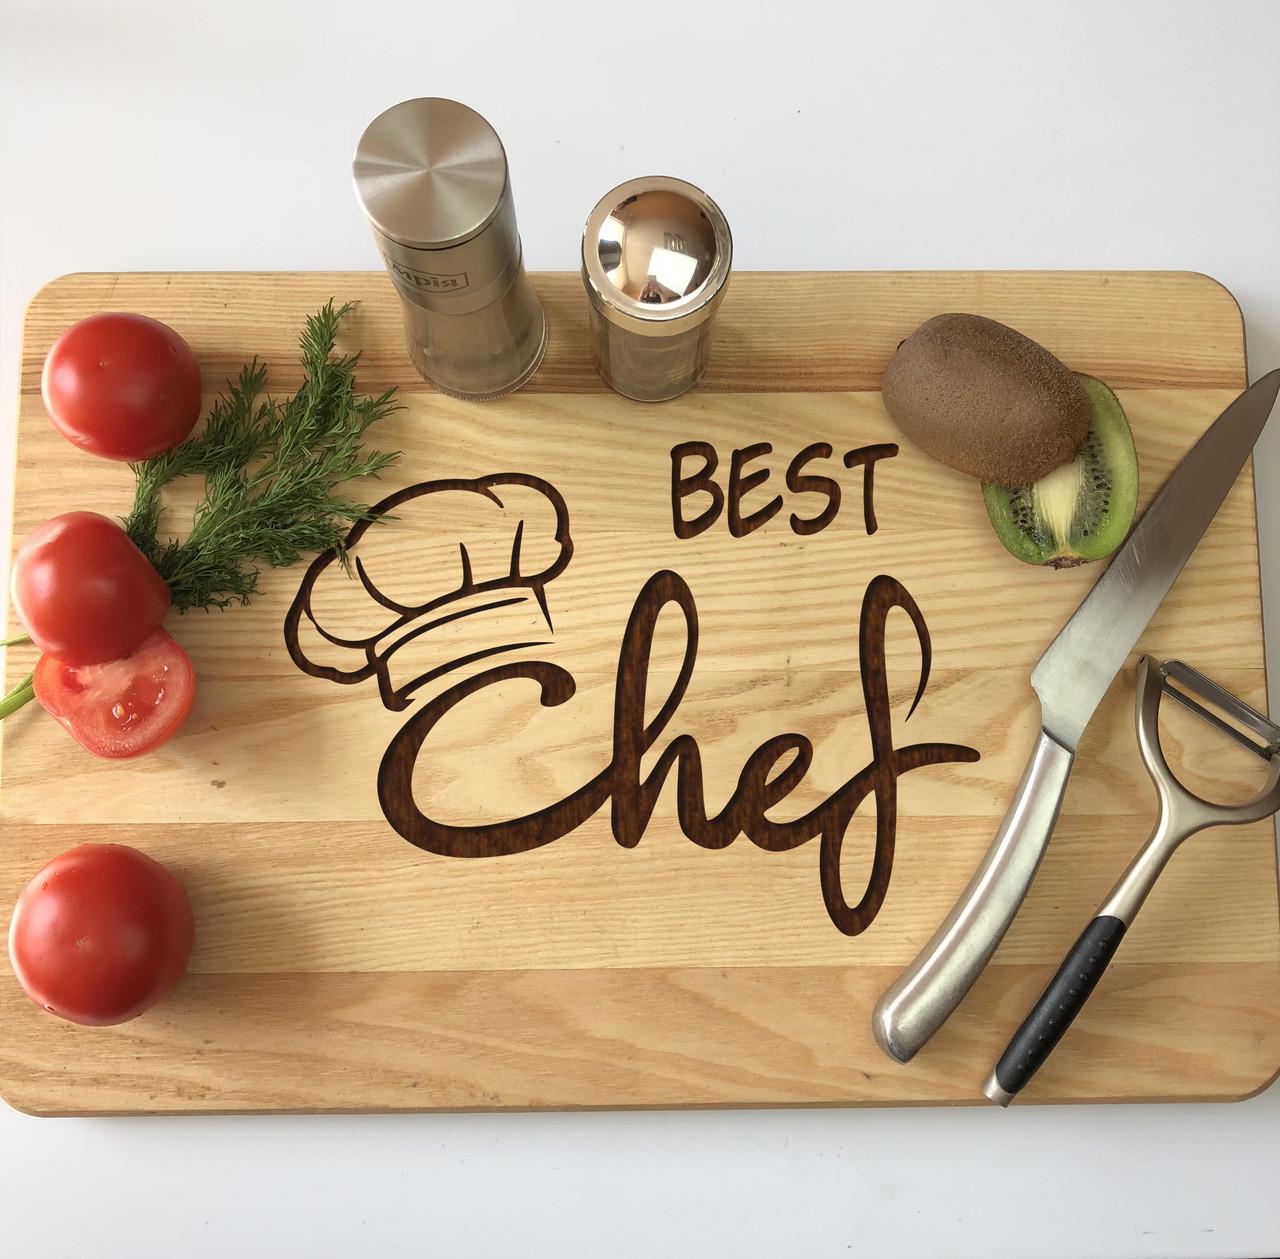 Кухонная доска из дерева «Best Chef» 40 х 25 см